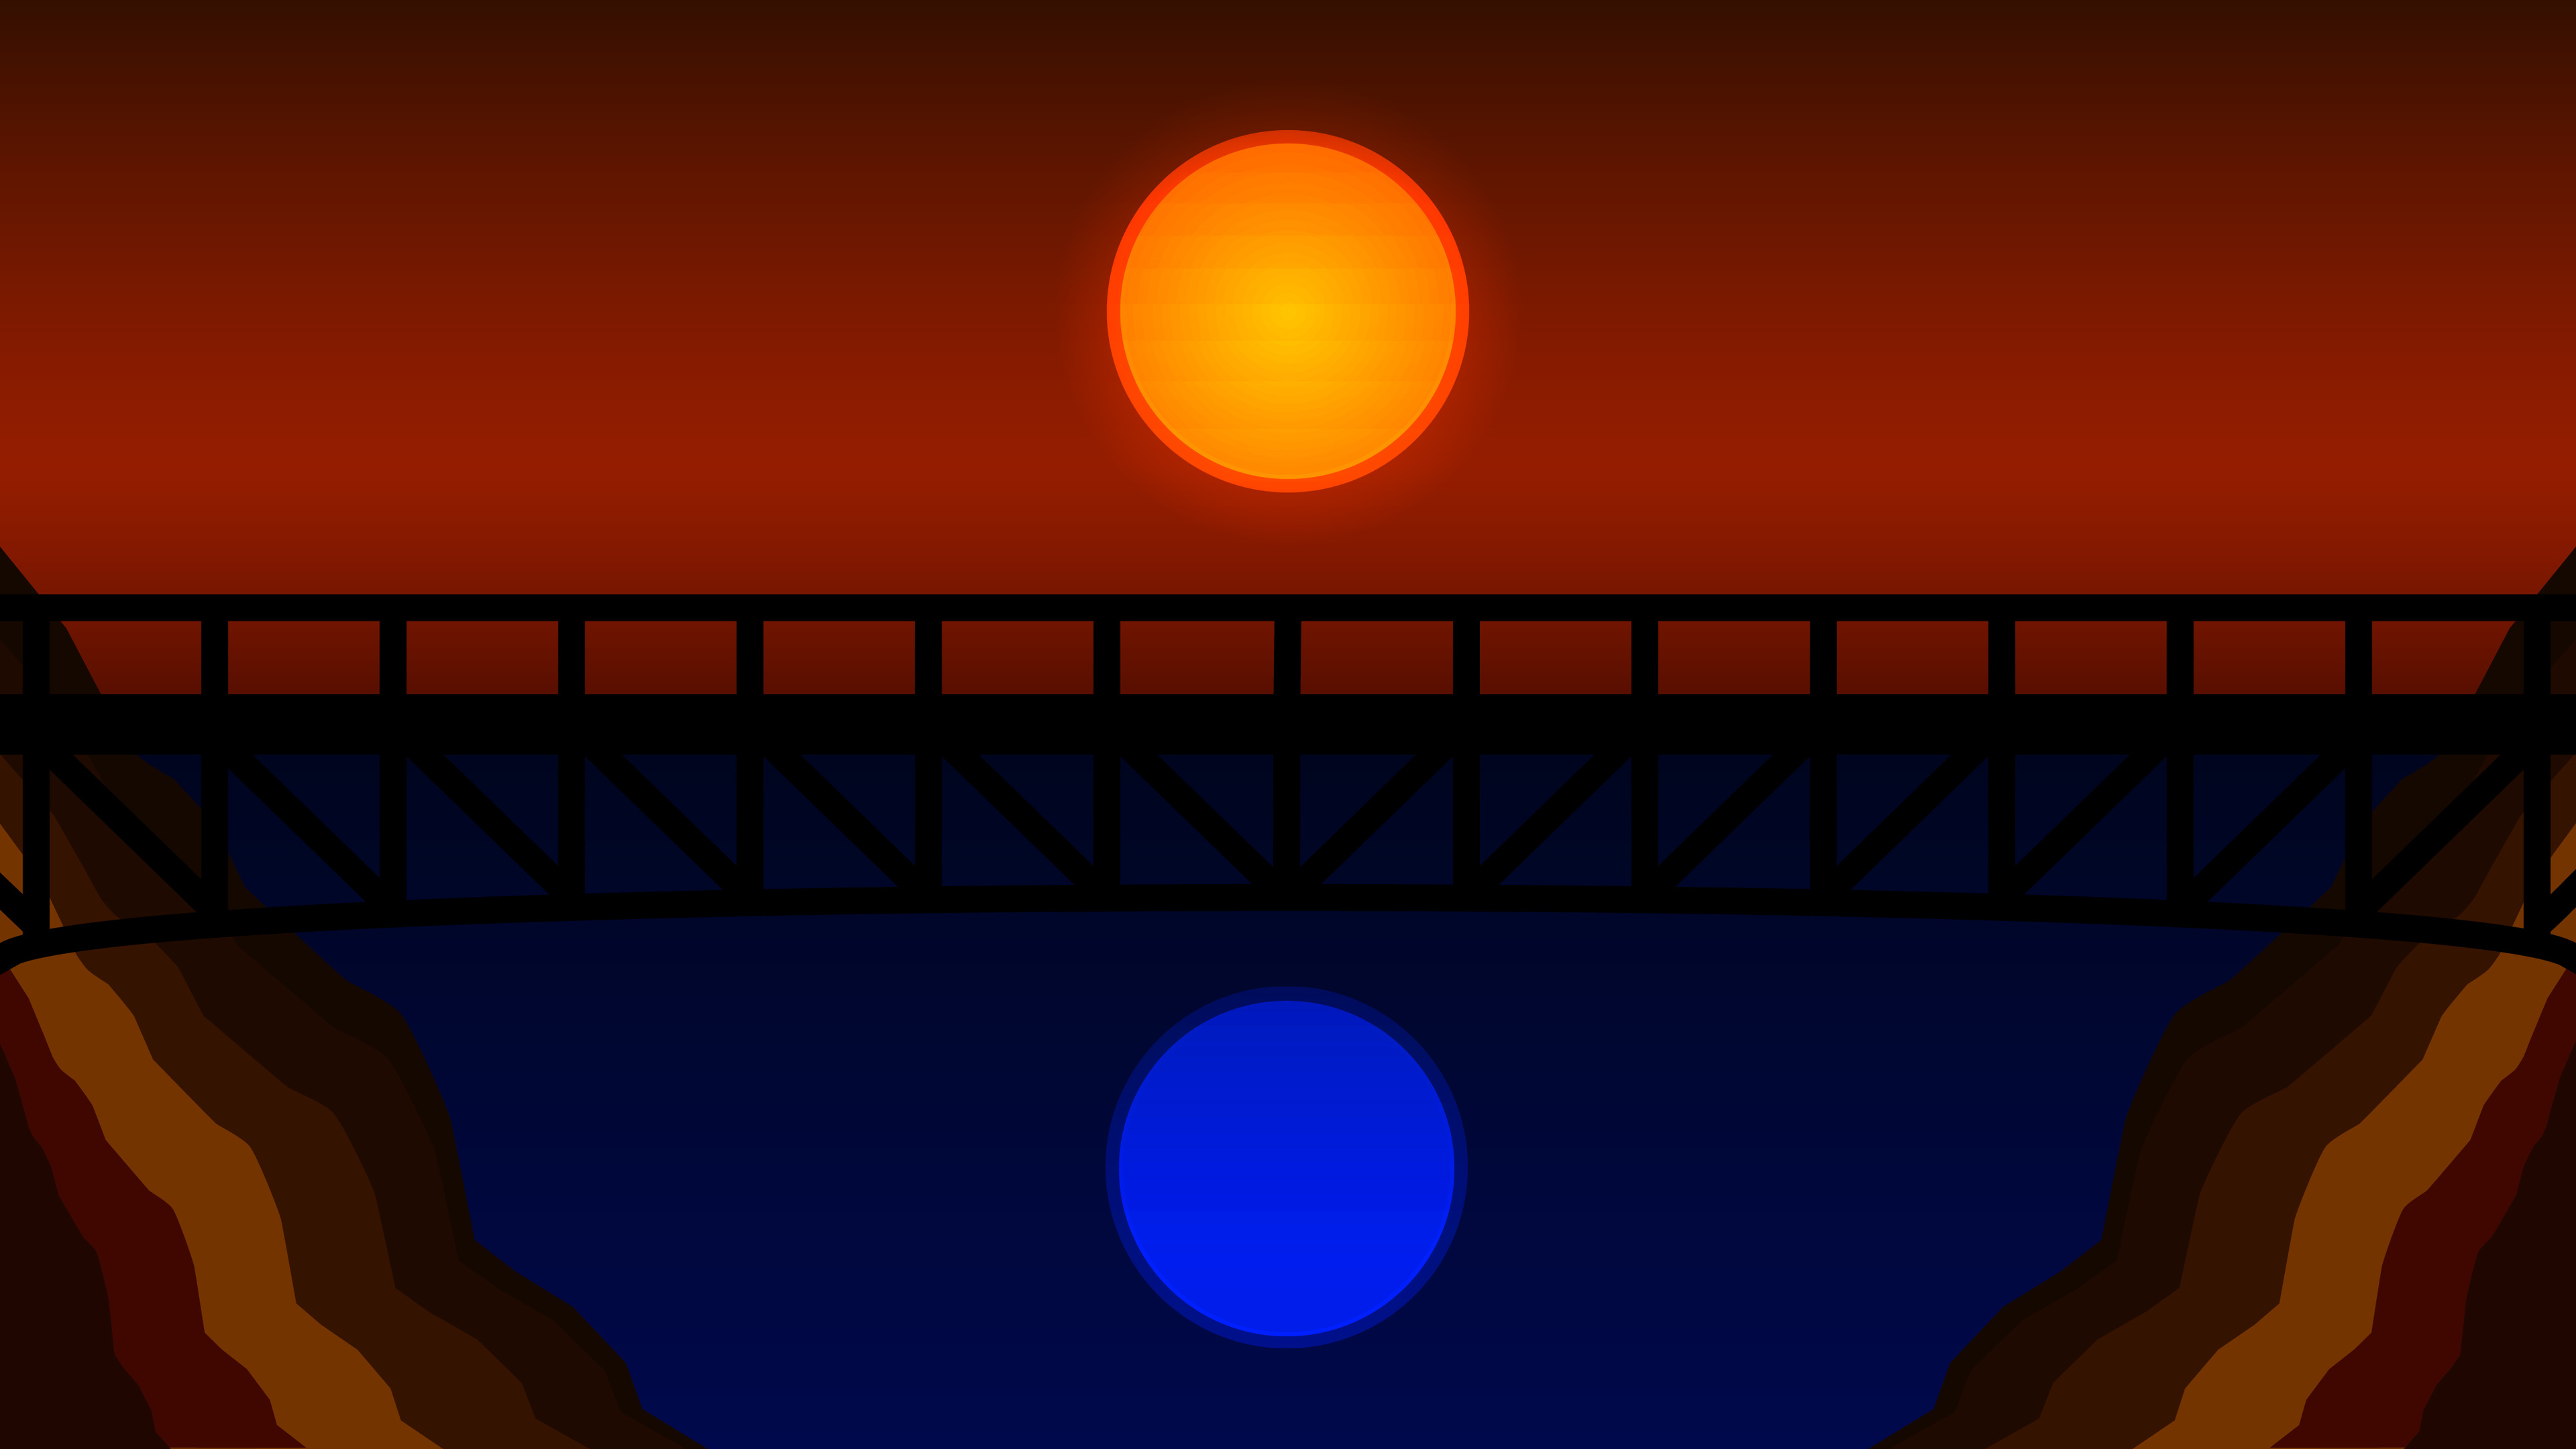 bridge minimalistic 4k 1540755529 - Bridge Minimalistic 4k - minimalism wallpapers, hd-wallpapers, digital art wallpapers, bridge wallpapers, artwork wallpapers, artist wallpapers, 4k-wallpapers